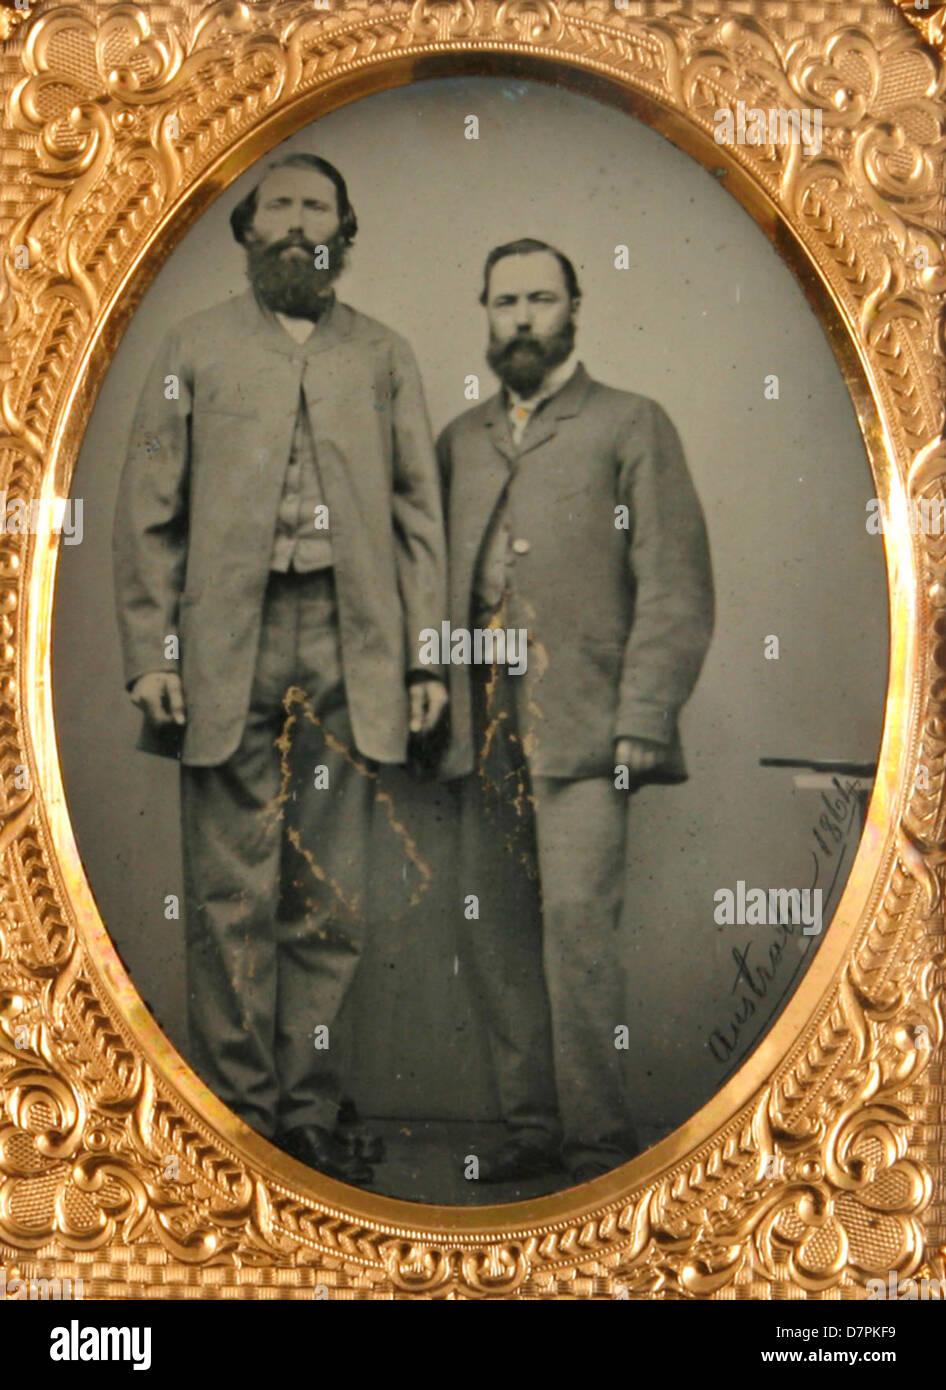 Unidentified men - Stock Image